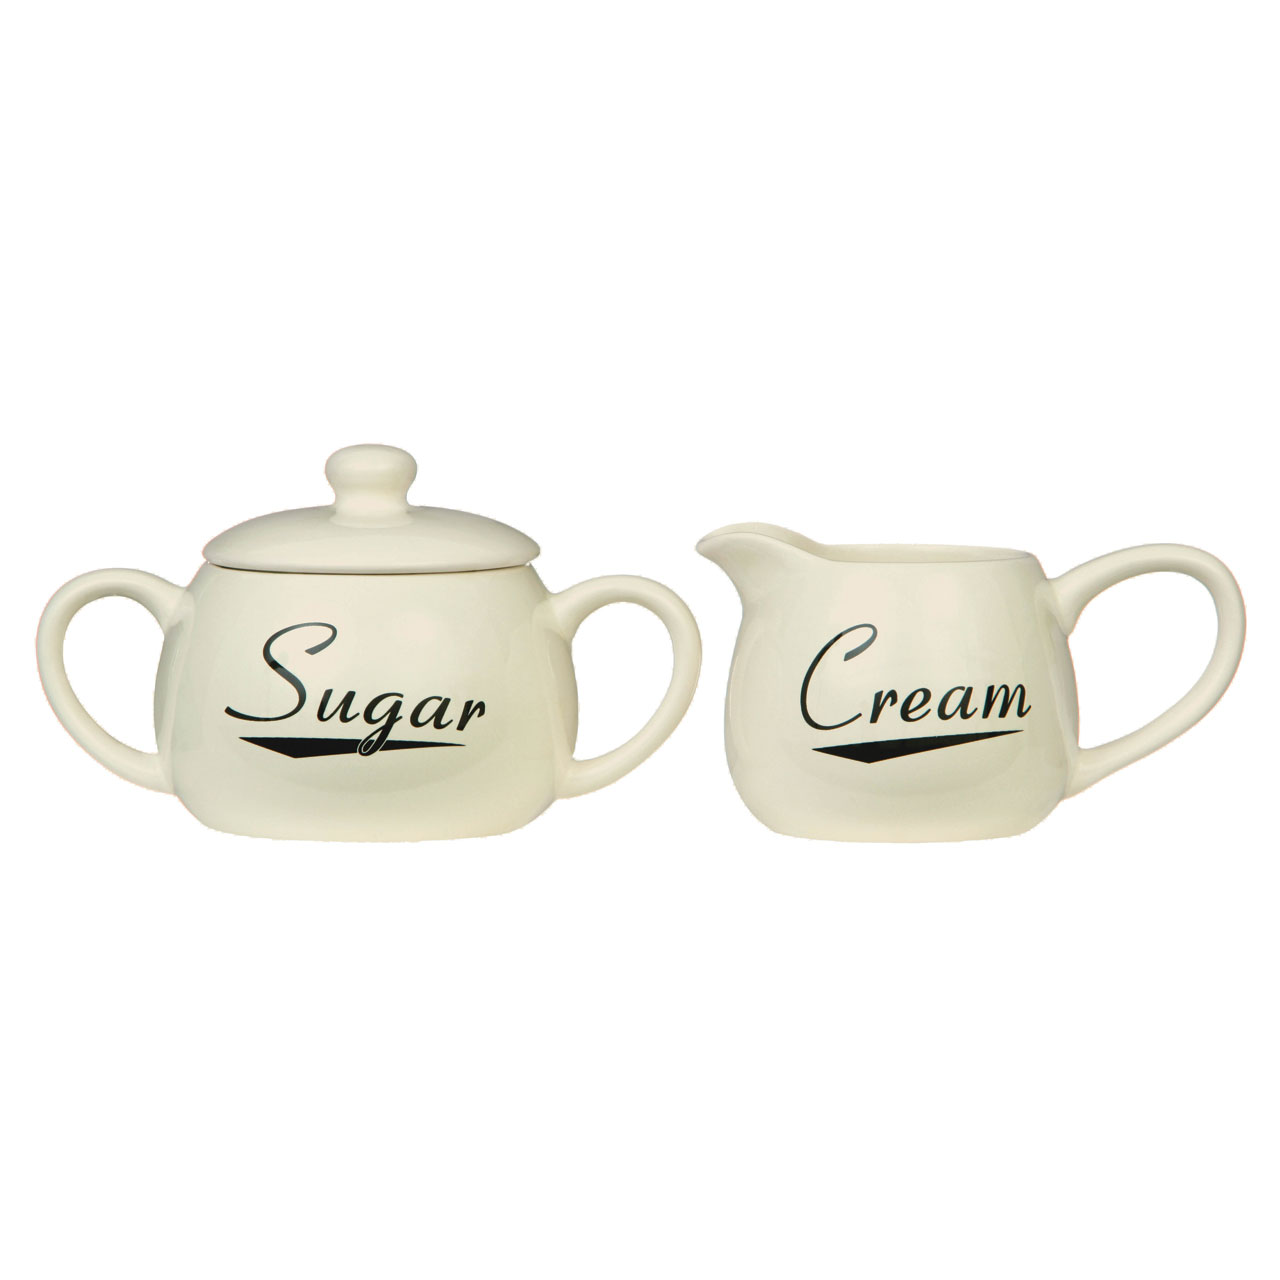 cream coronet kitchen ceramic storage canisters jars set. Black Bedroom Furniture Sets. Home Design Ideas